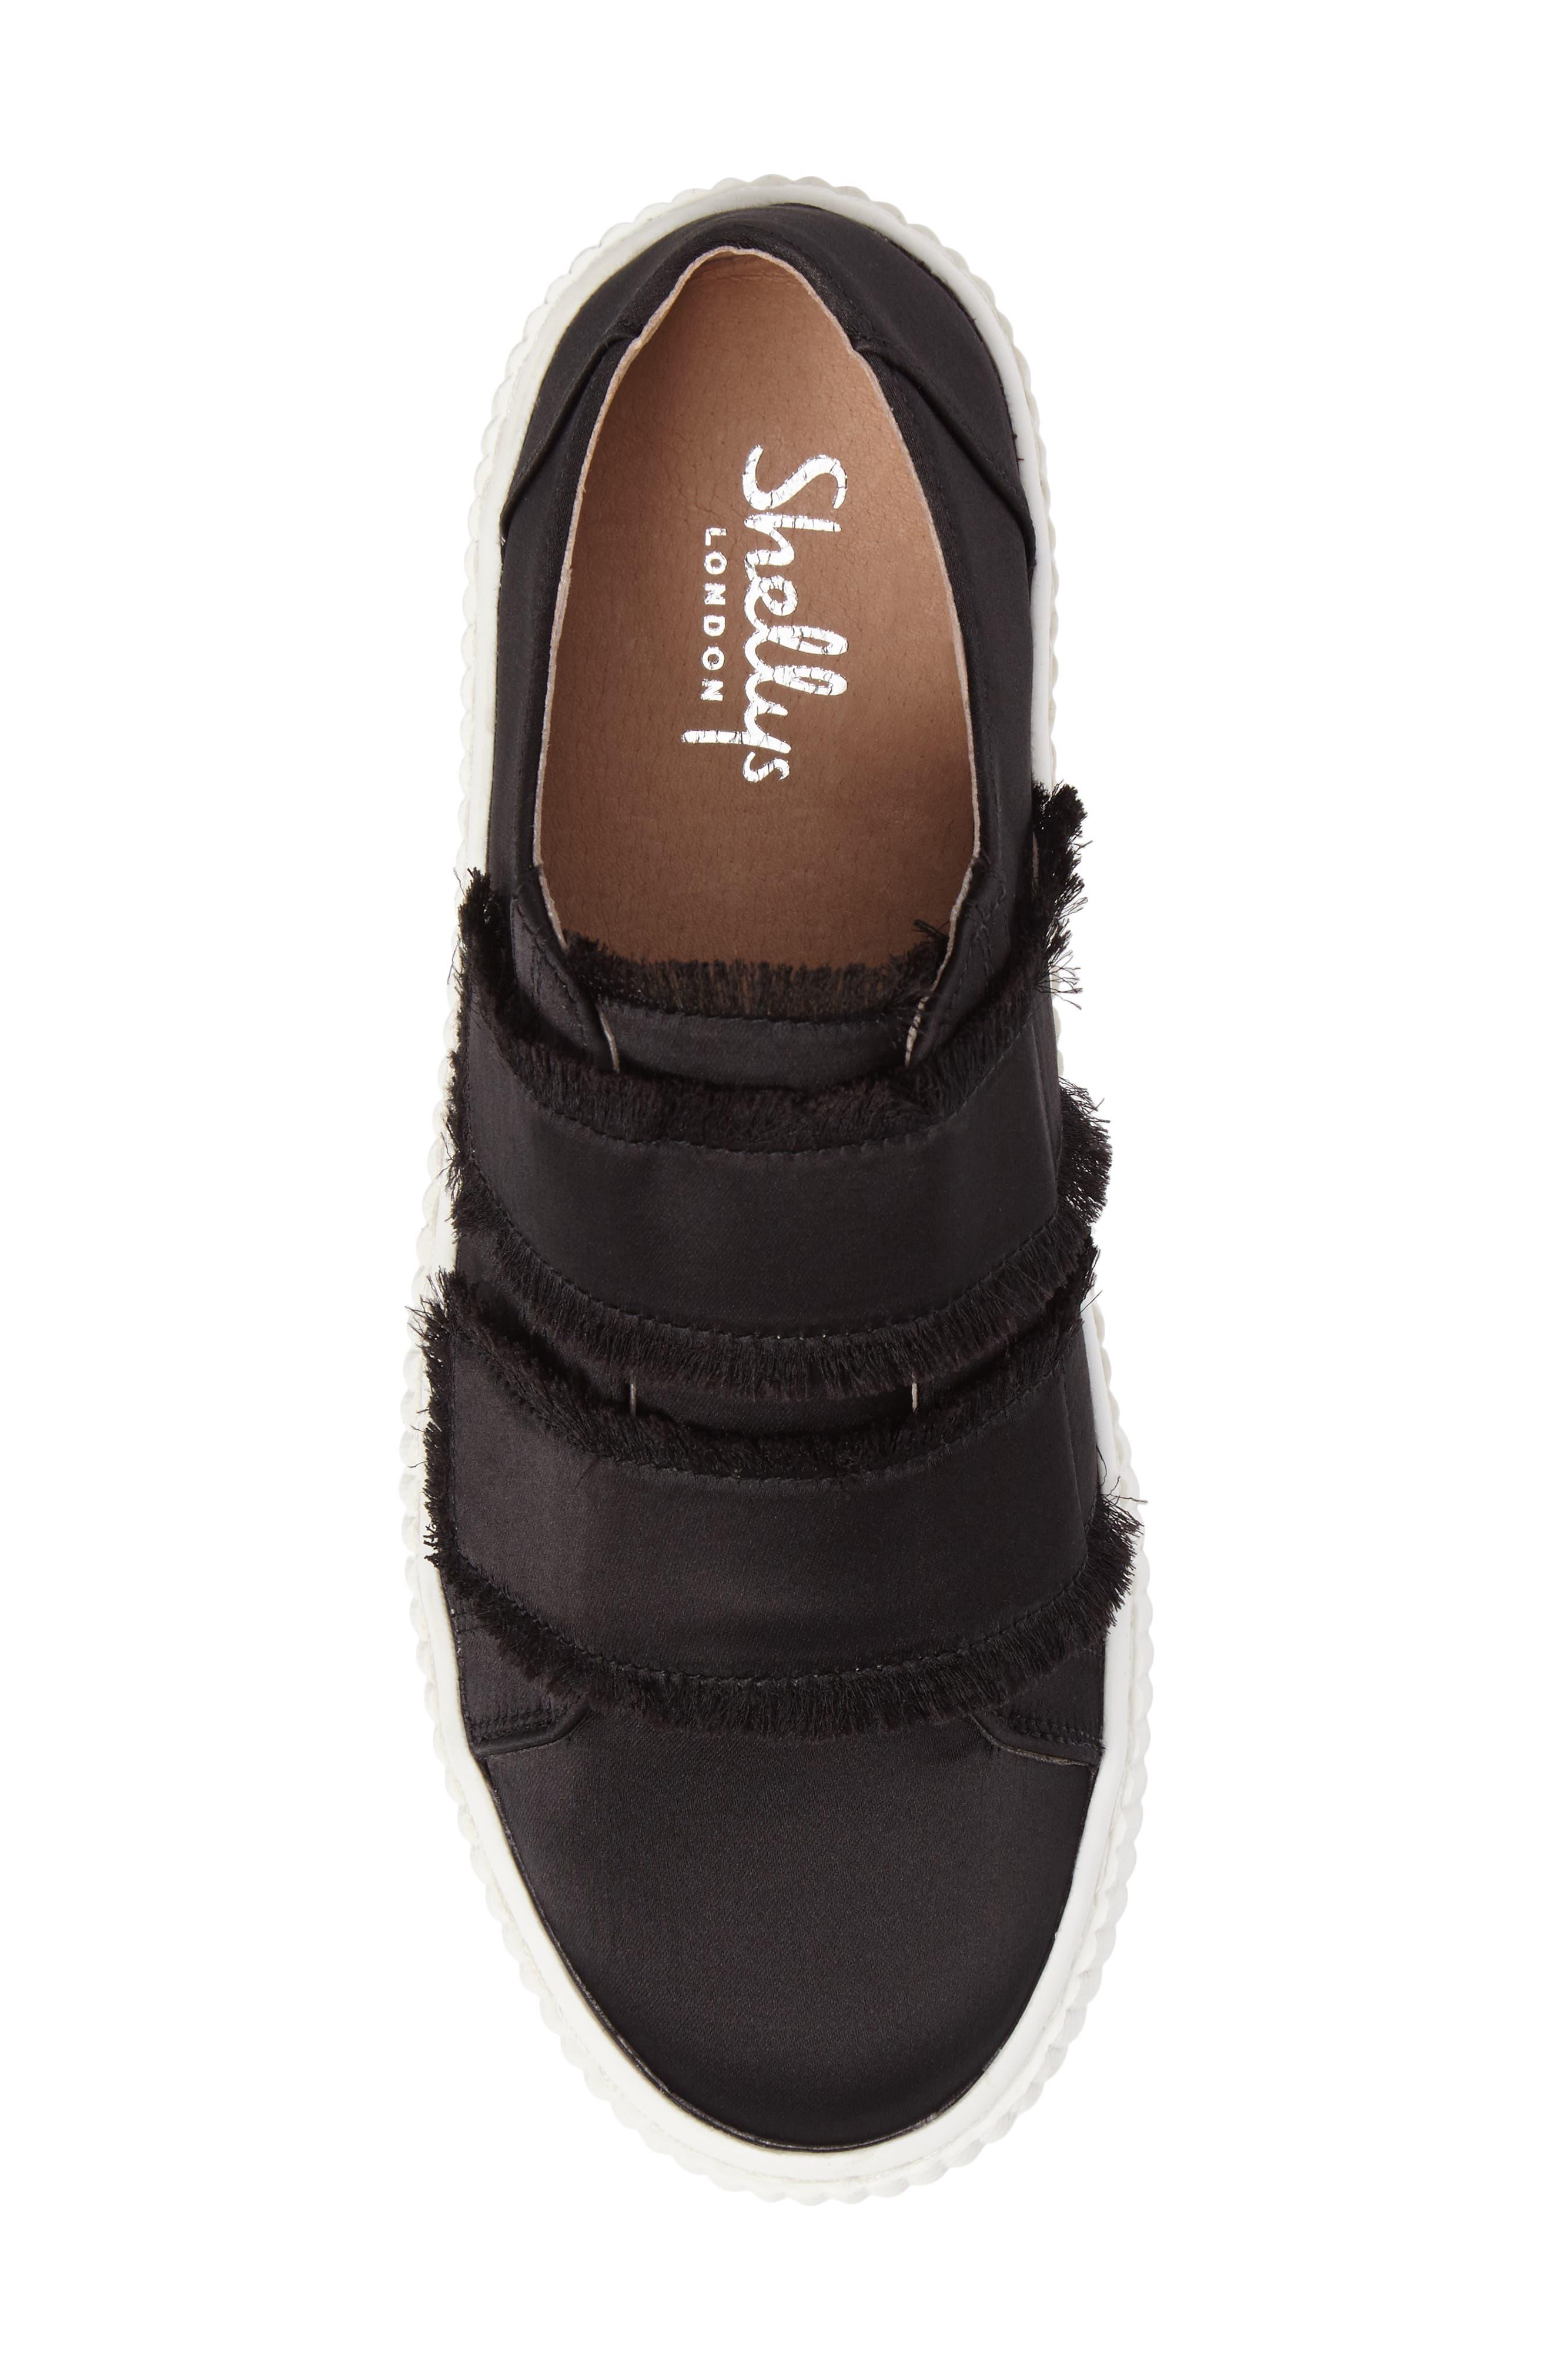 Elder Fringed Platform Sneaker,                             Alternate thumbnail 5, color,                             Black